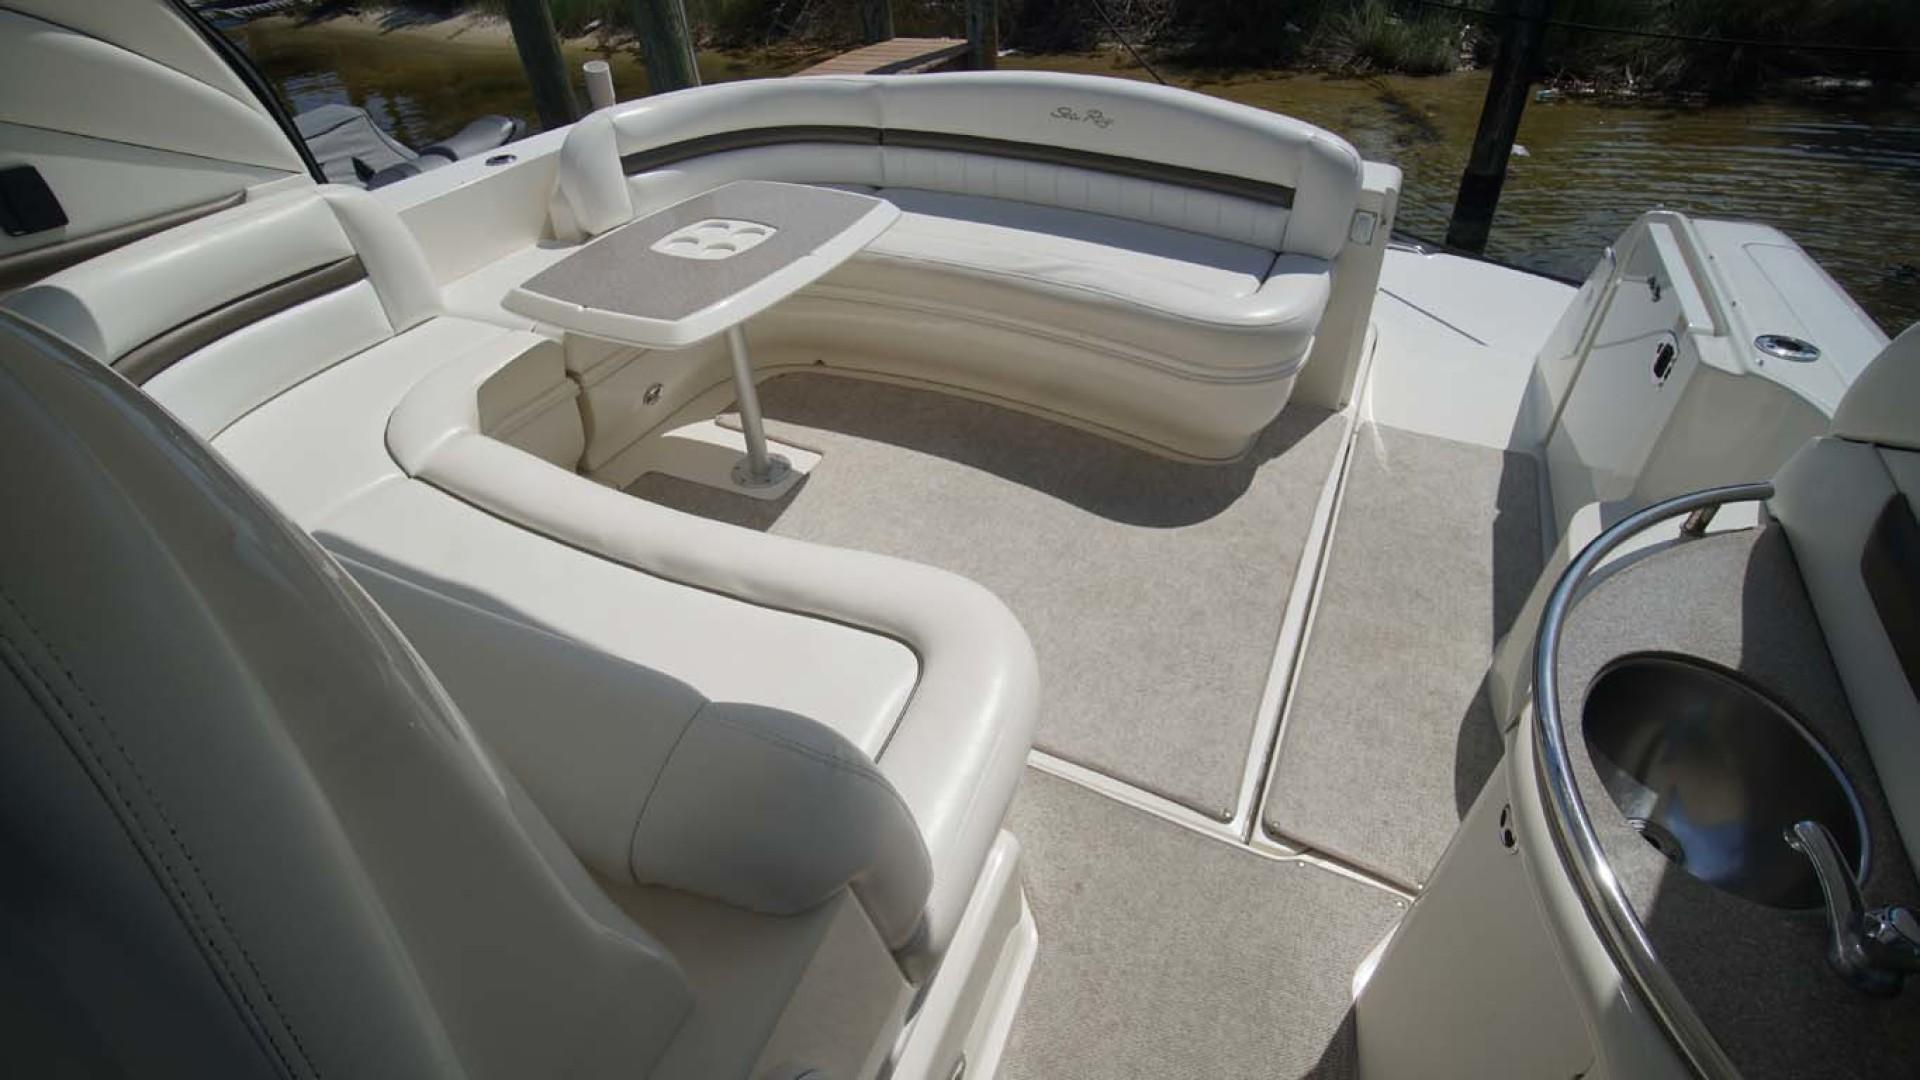 Sea Ray-Sundancer 2006-Late Fee Destin-Florida-United States-Cockpit Carpeting-1125986 | Thumbnail